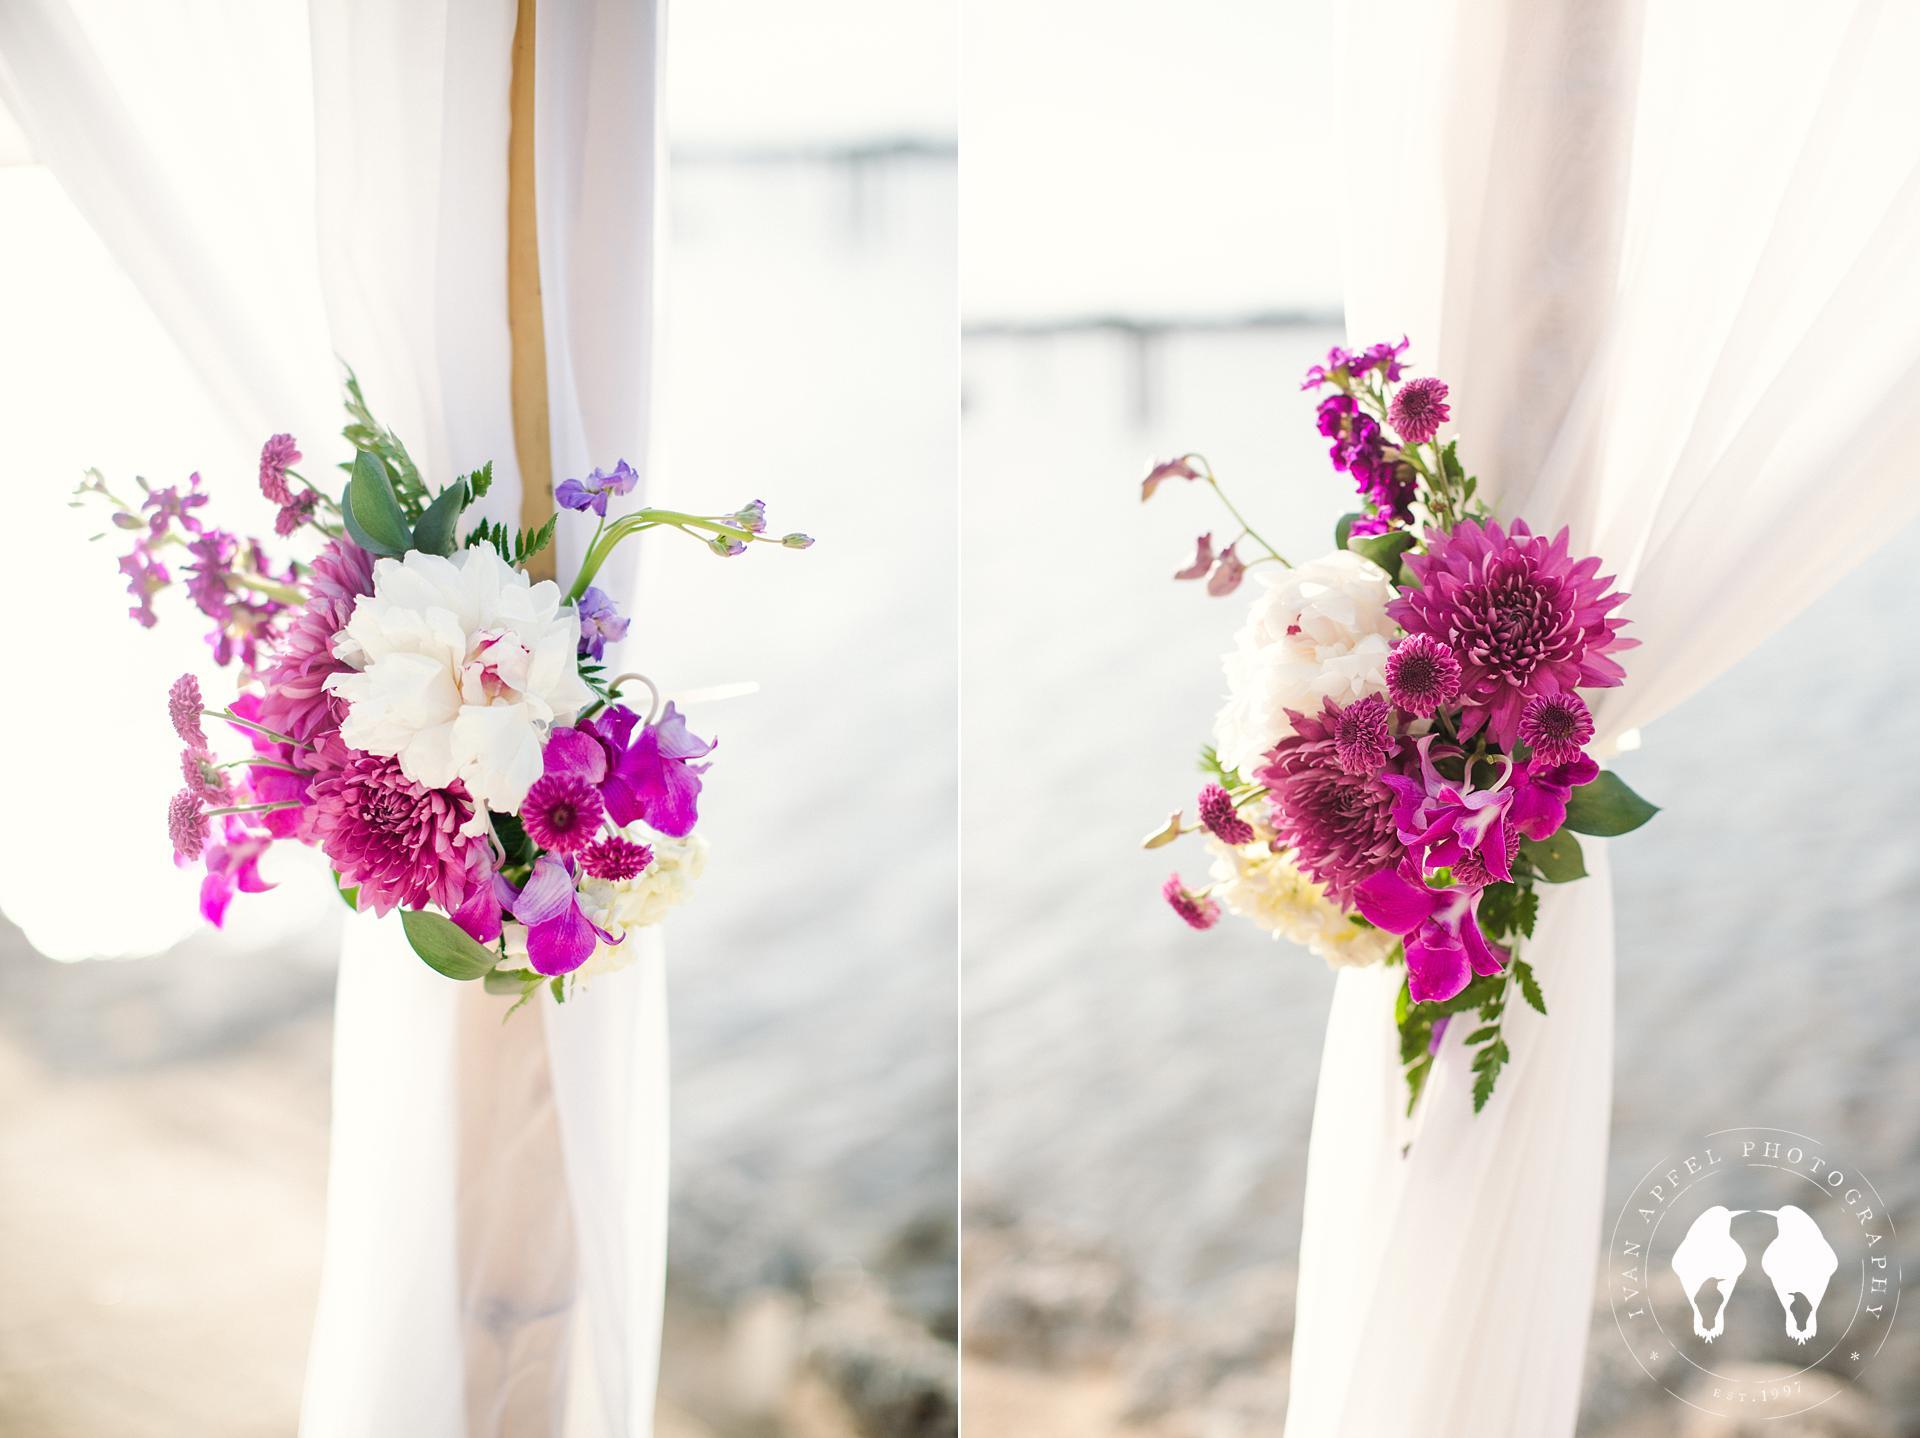 Islamorada-Wedding-Post-Card-Inn-EandS-Ivan-Apfel-Photography_0029.jpg